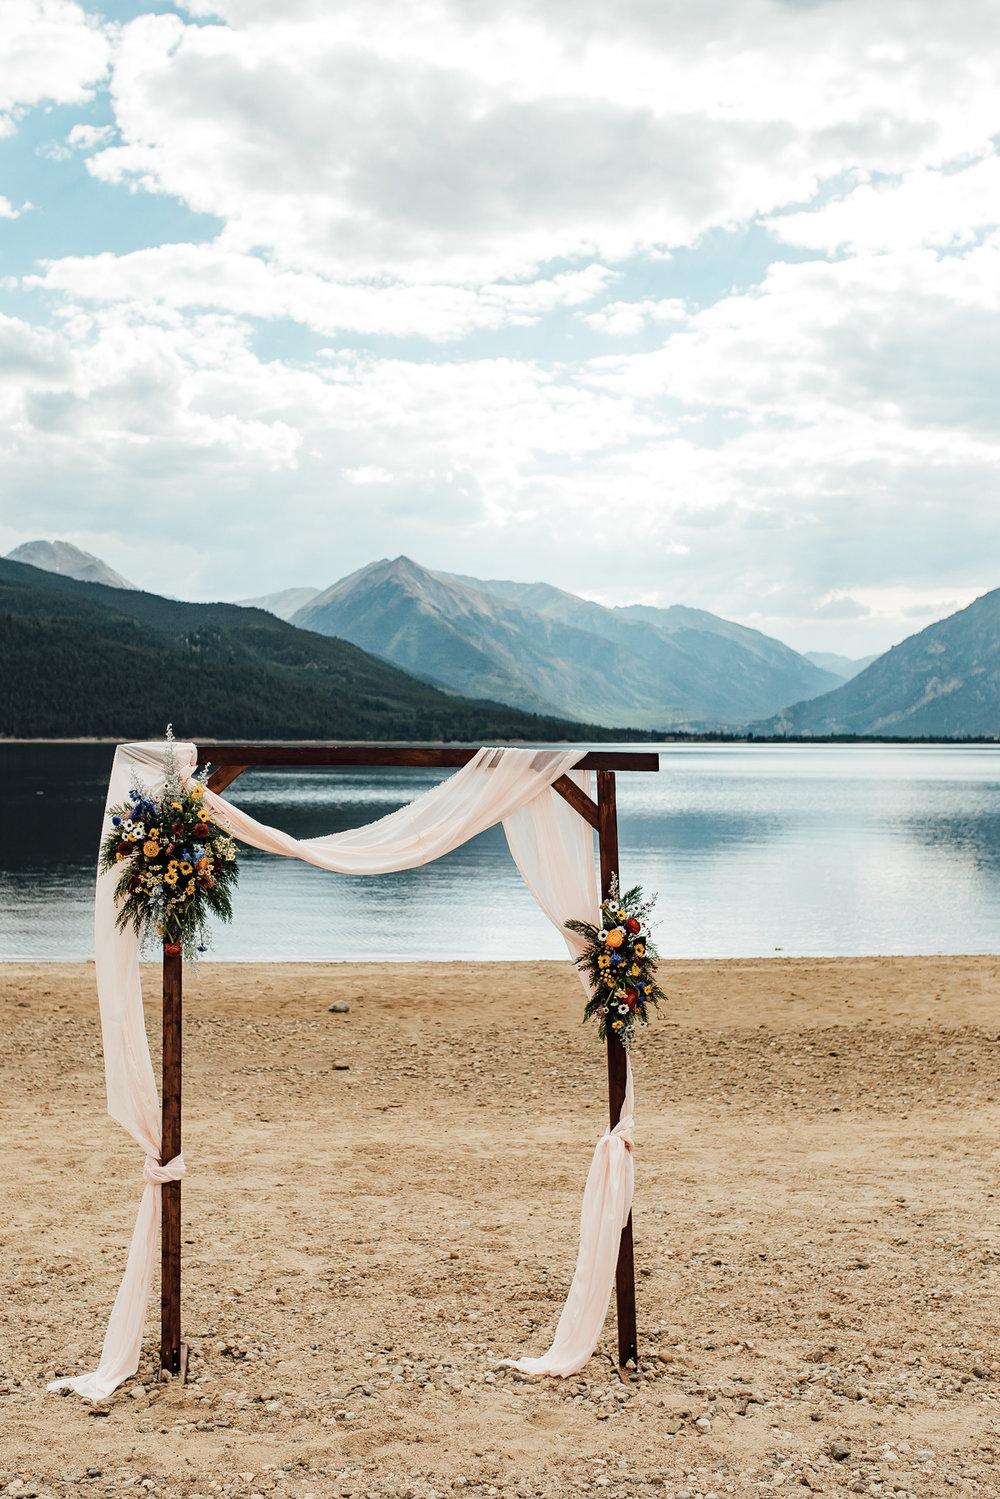 twin-lakes-colorado-colorado-wedding-photographer-twin-lakes-wedding-photographer-aspen-wedding-thewarmtharoundyou (2 of 5).jpg